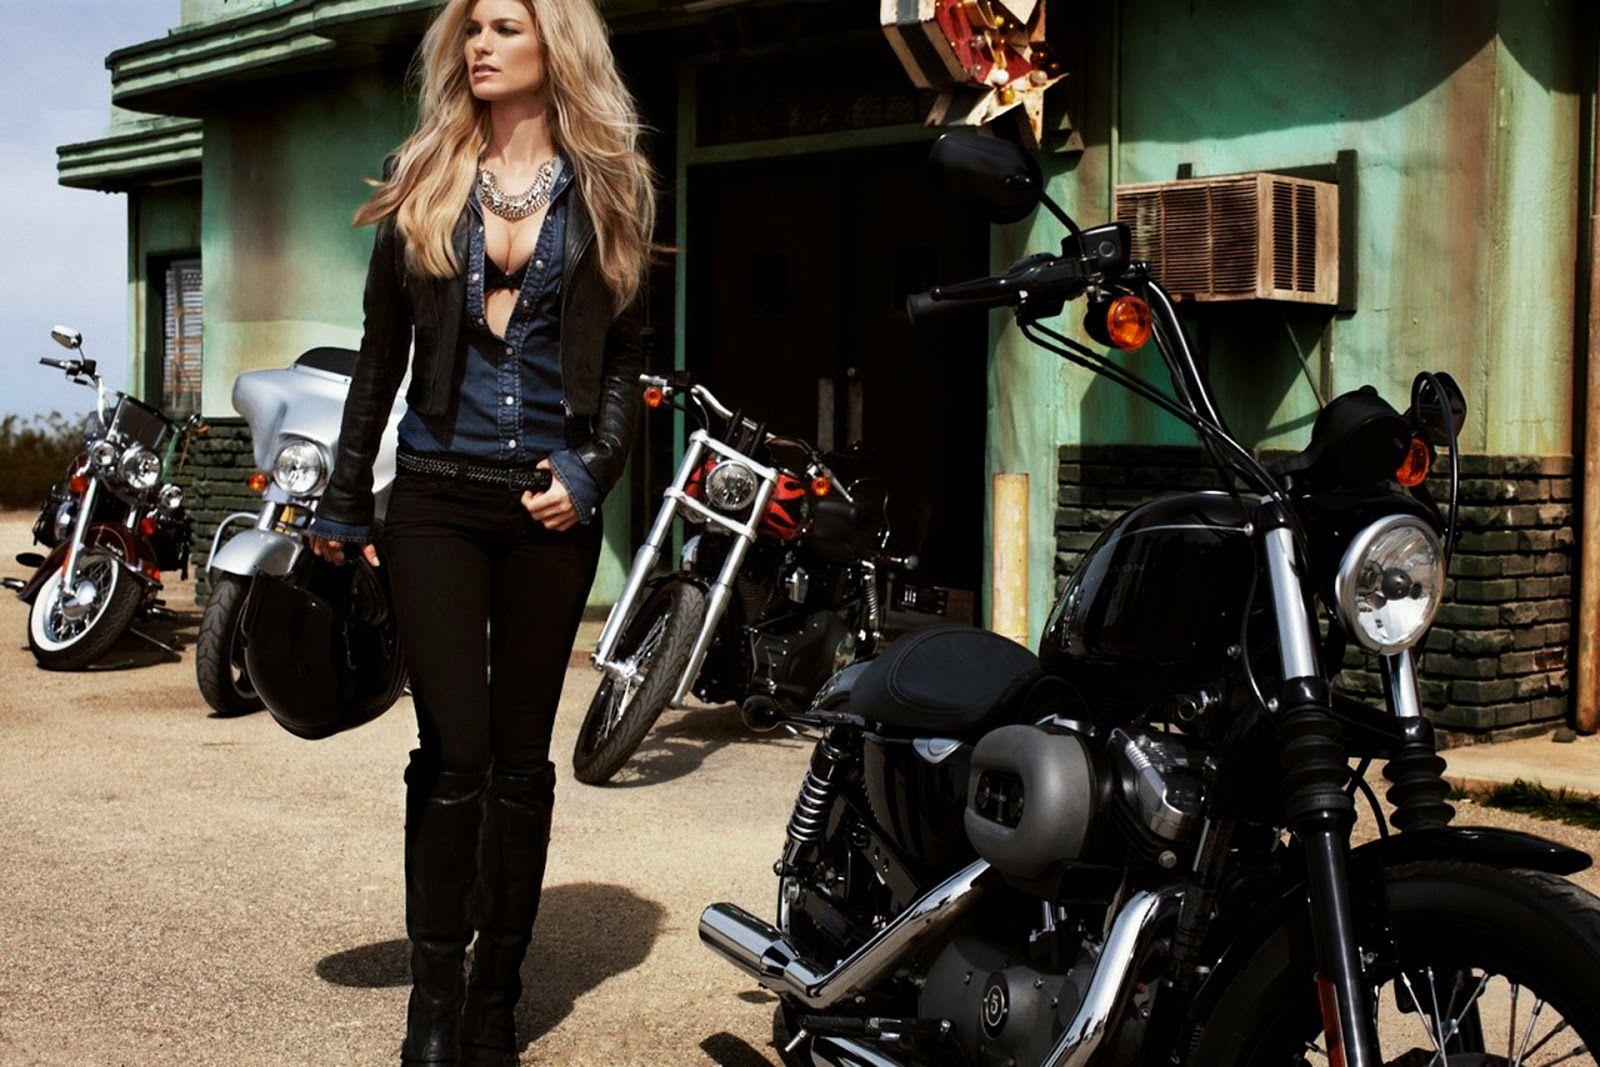 Harley Davidson: Motographite: MARISA MILLER FOR HARLEY DAVIDSON